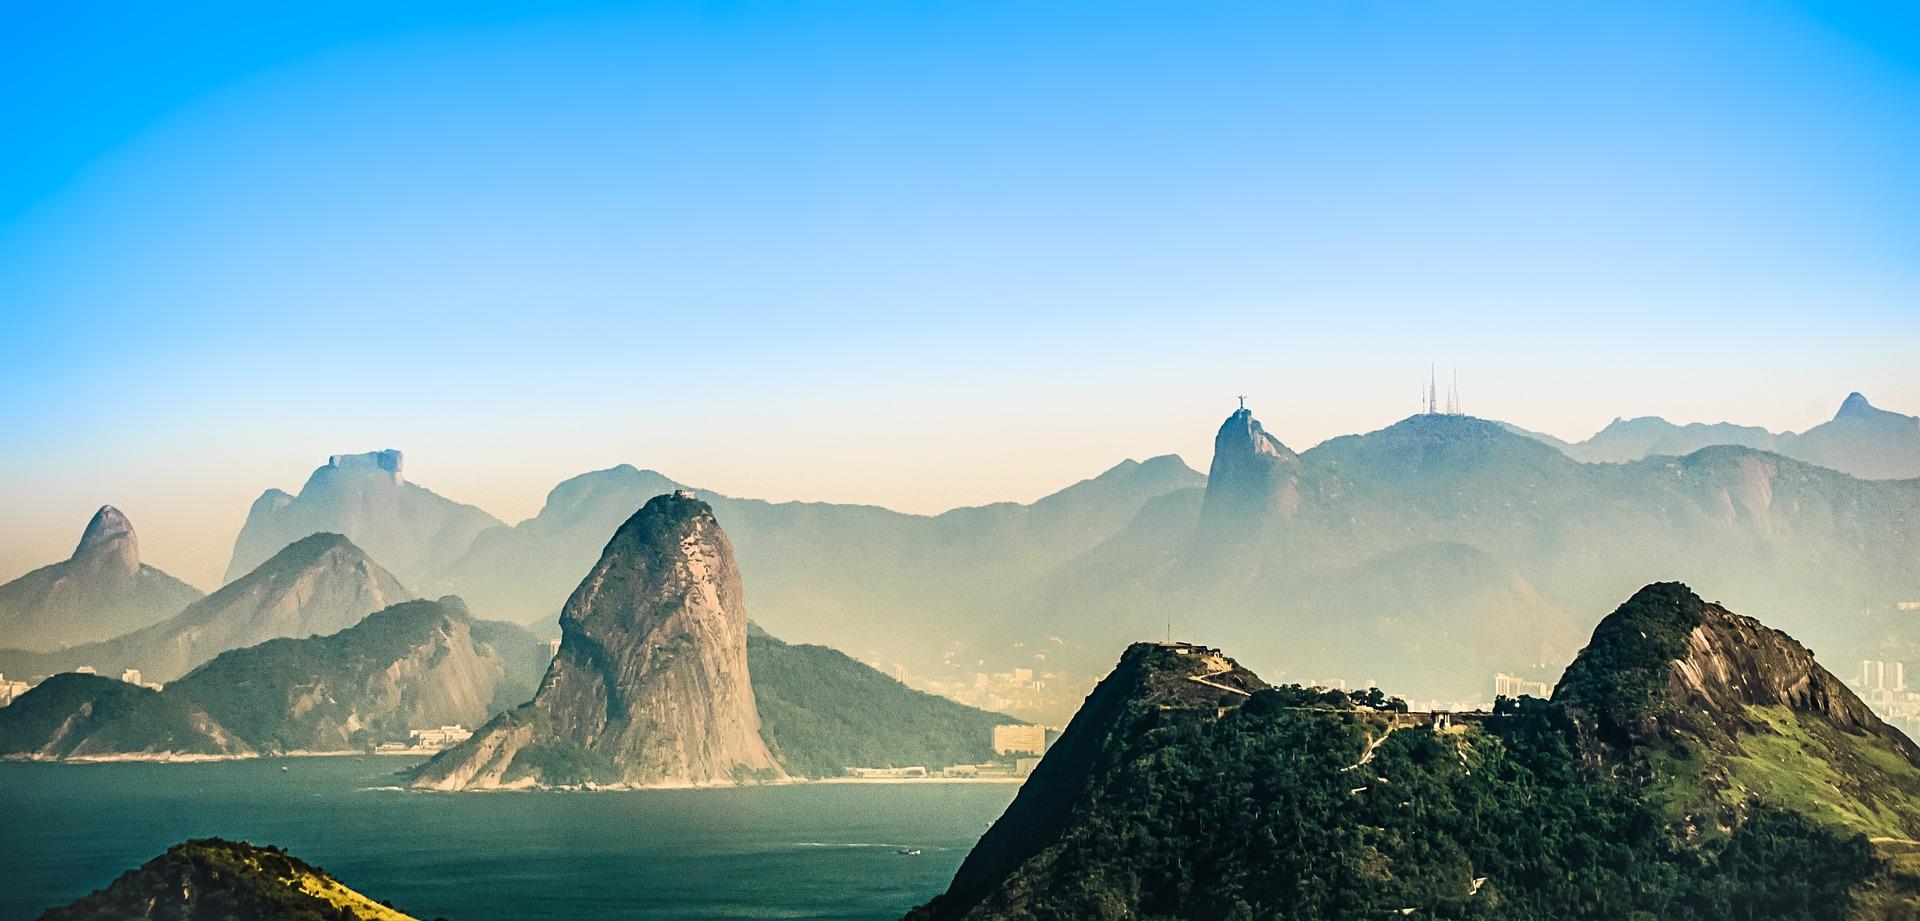 río de janeiro, brasil, cristo redentor, juegos olímpicos, olimpiadas - Fondos de Pantalla HD - professor-falken.com